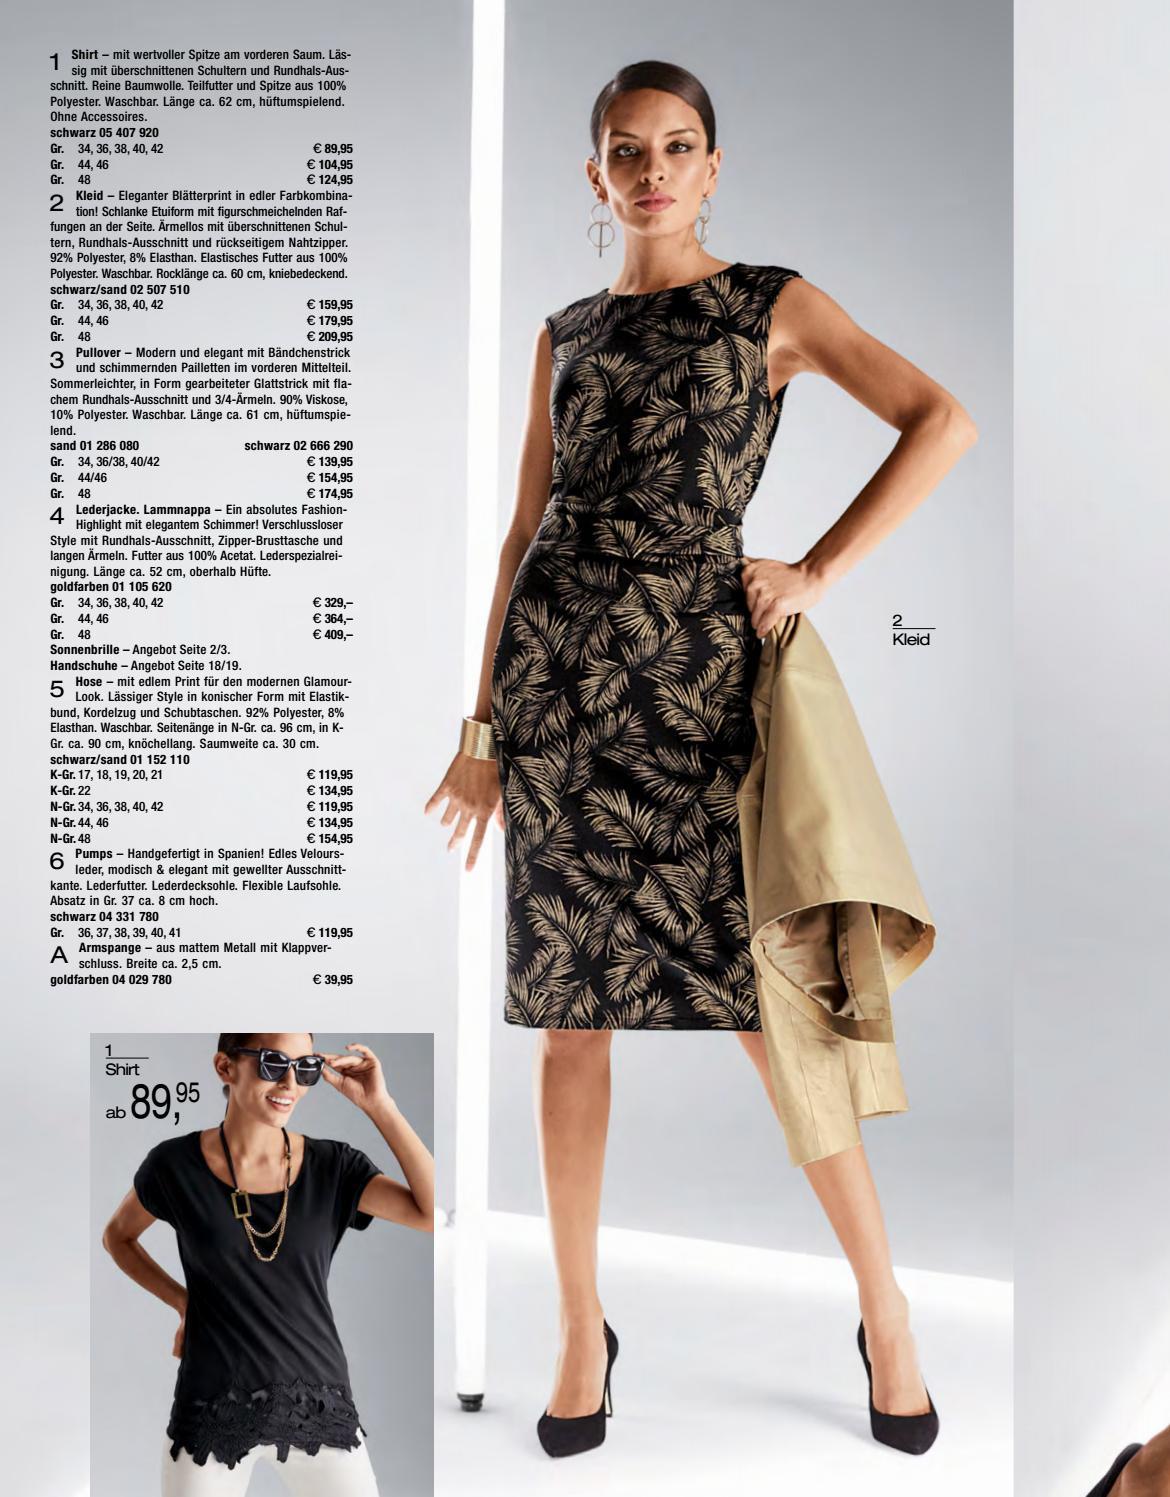 15 Genial Elegante Kleider Knöchellang Design17 Schön Elegante Kleider Knöchellang Vertrieb